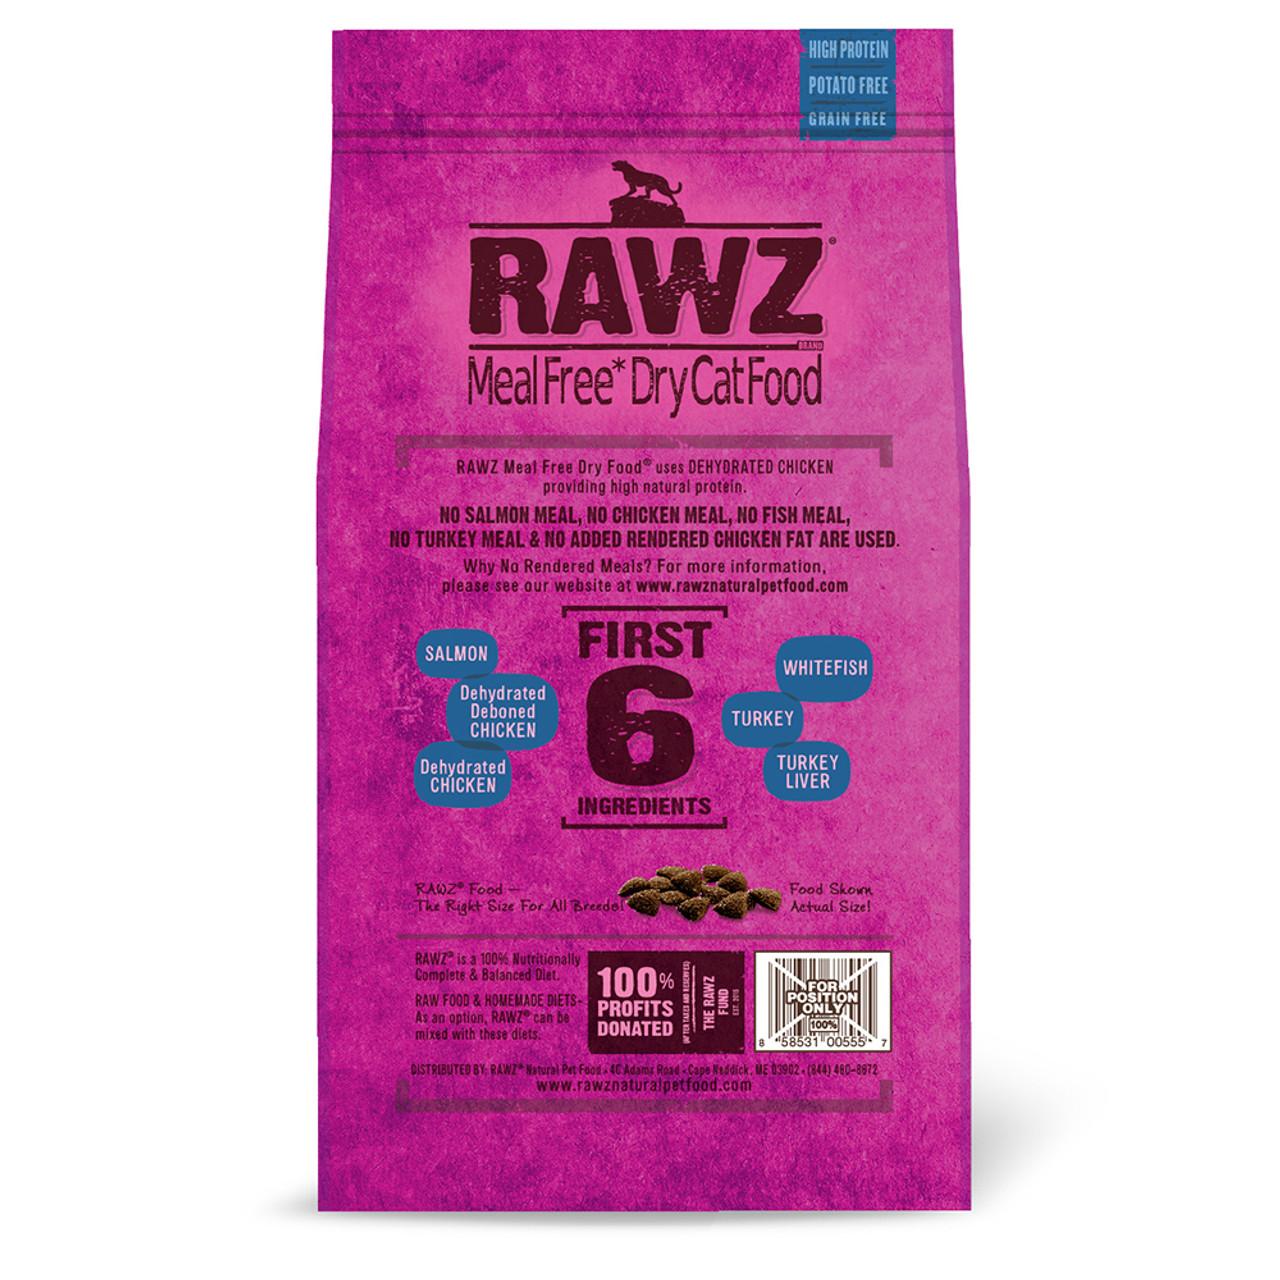 RAWZ Salmon, Dehydrated Chicken & Whitefish Recipe Natural Dry Cat Food